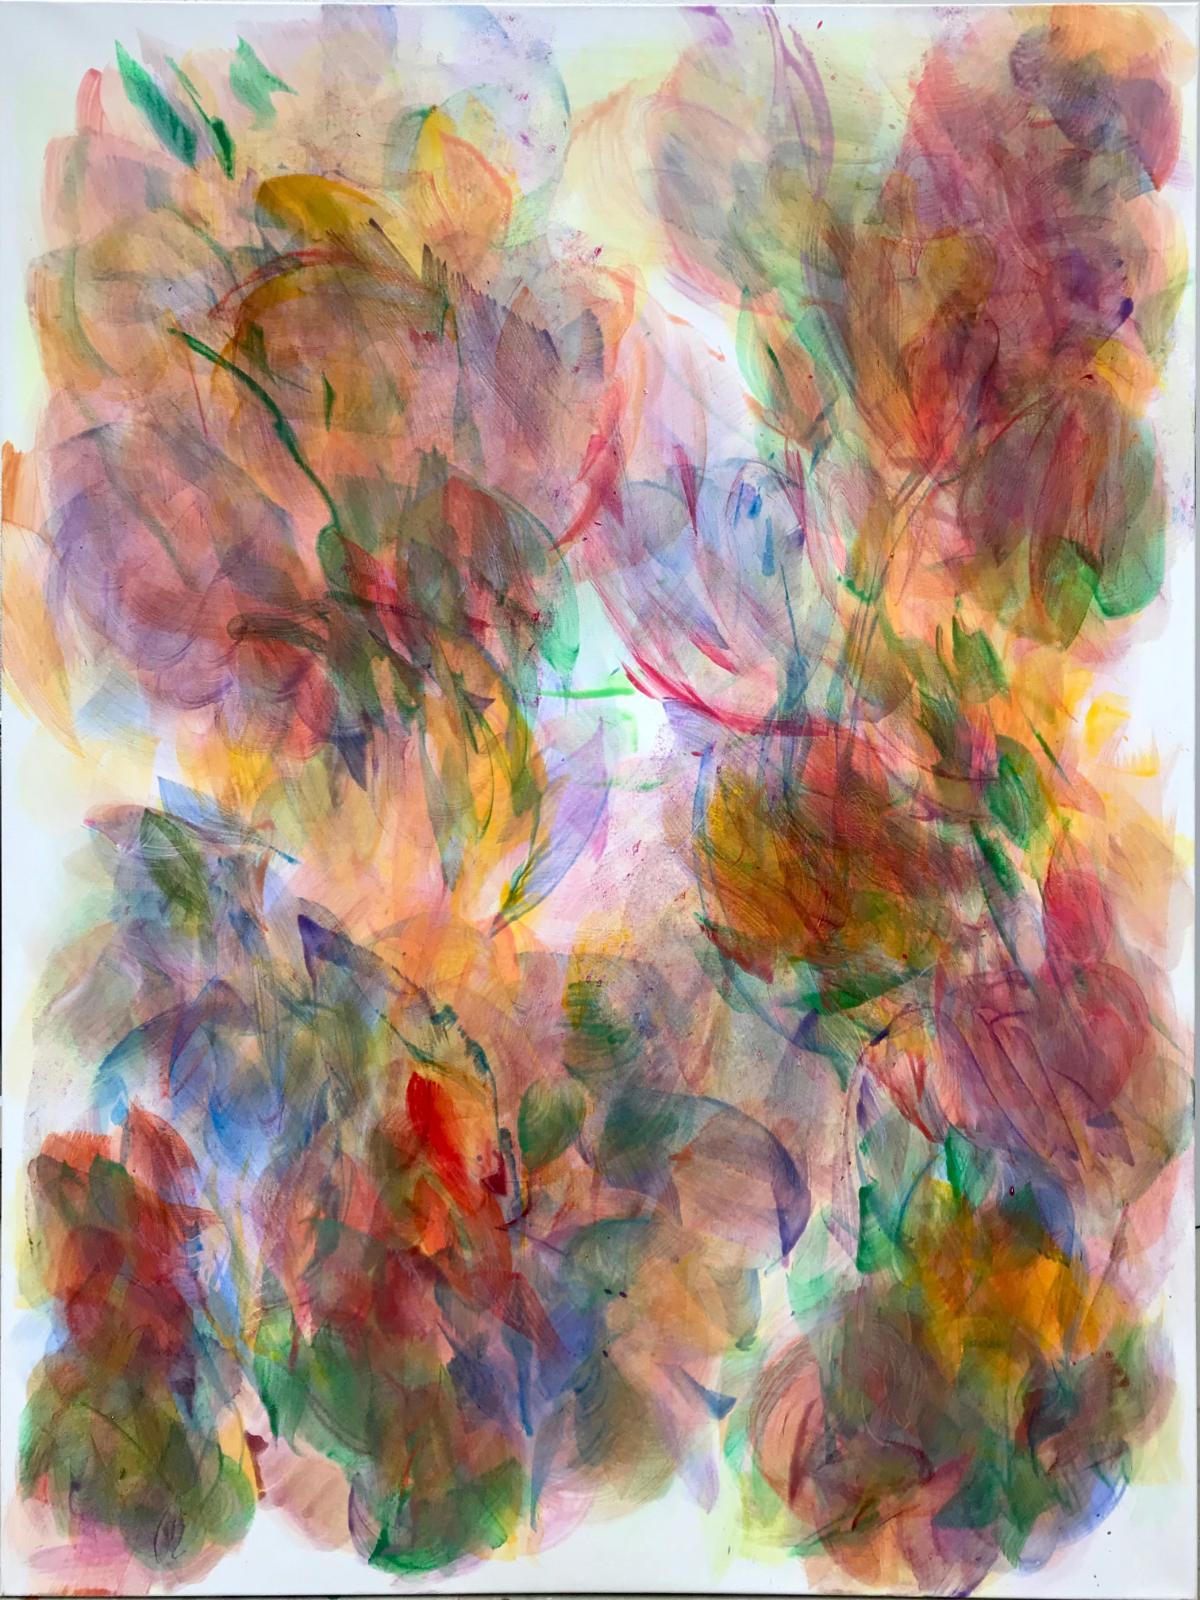 Hanspeter Münch, Ohne Titel, 15/2019, Acryl auf Leinwand, 180x150cm